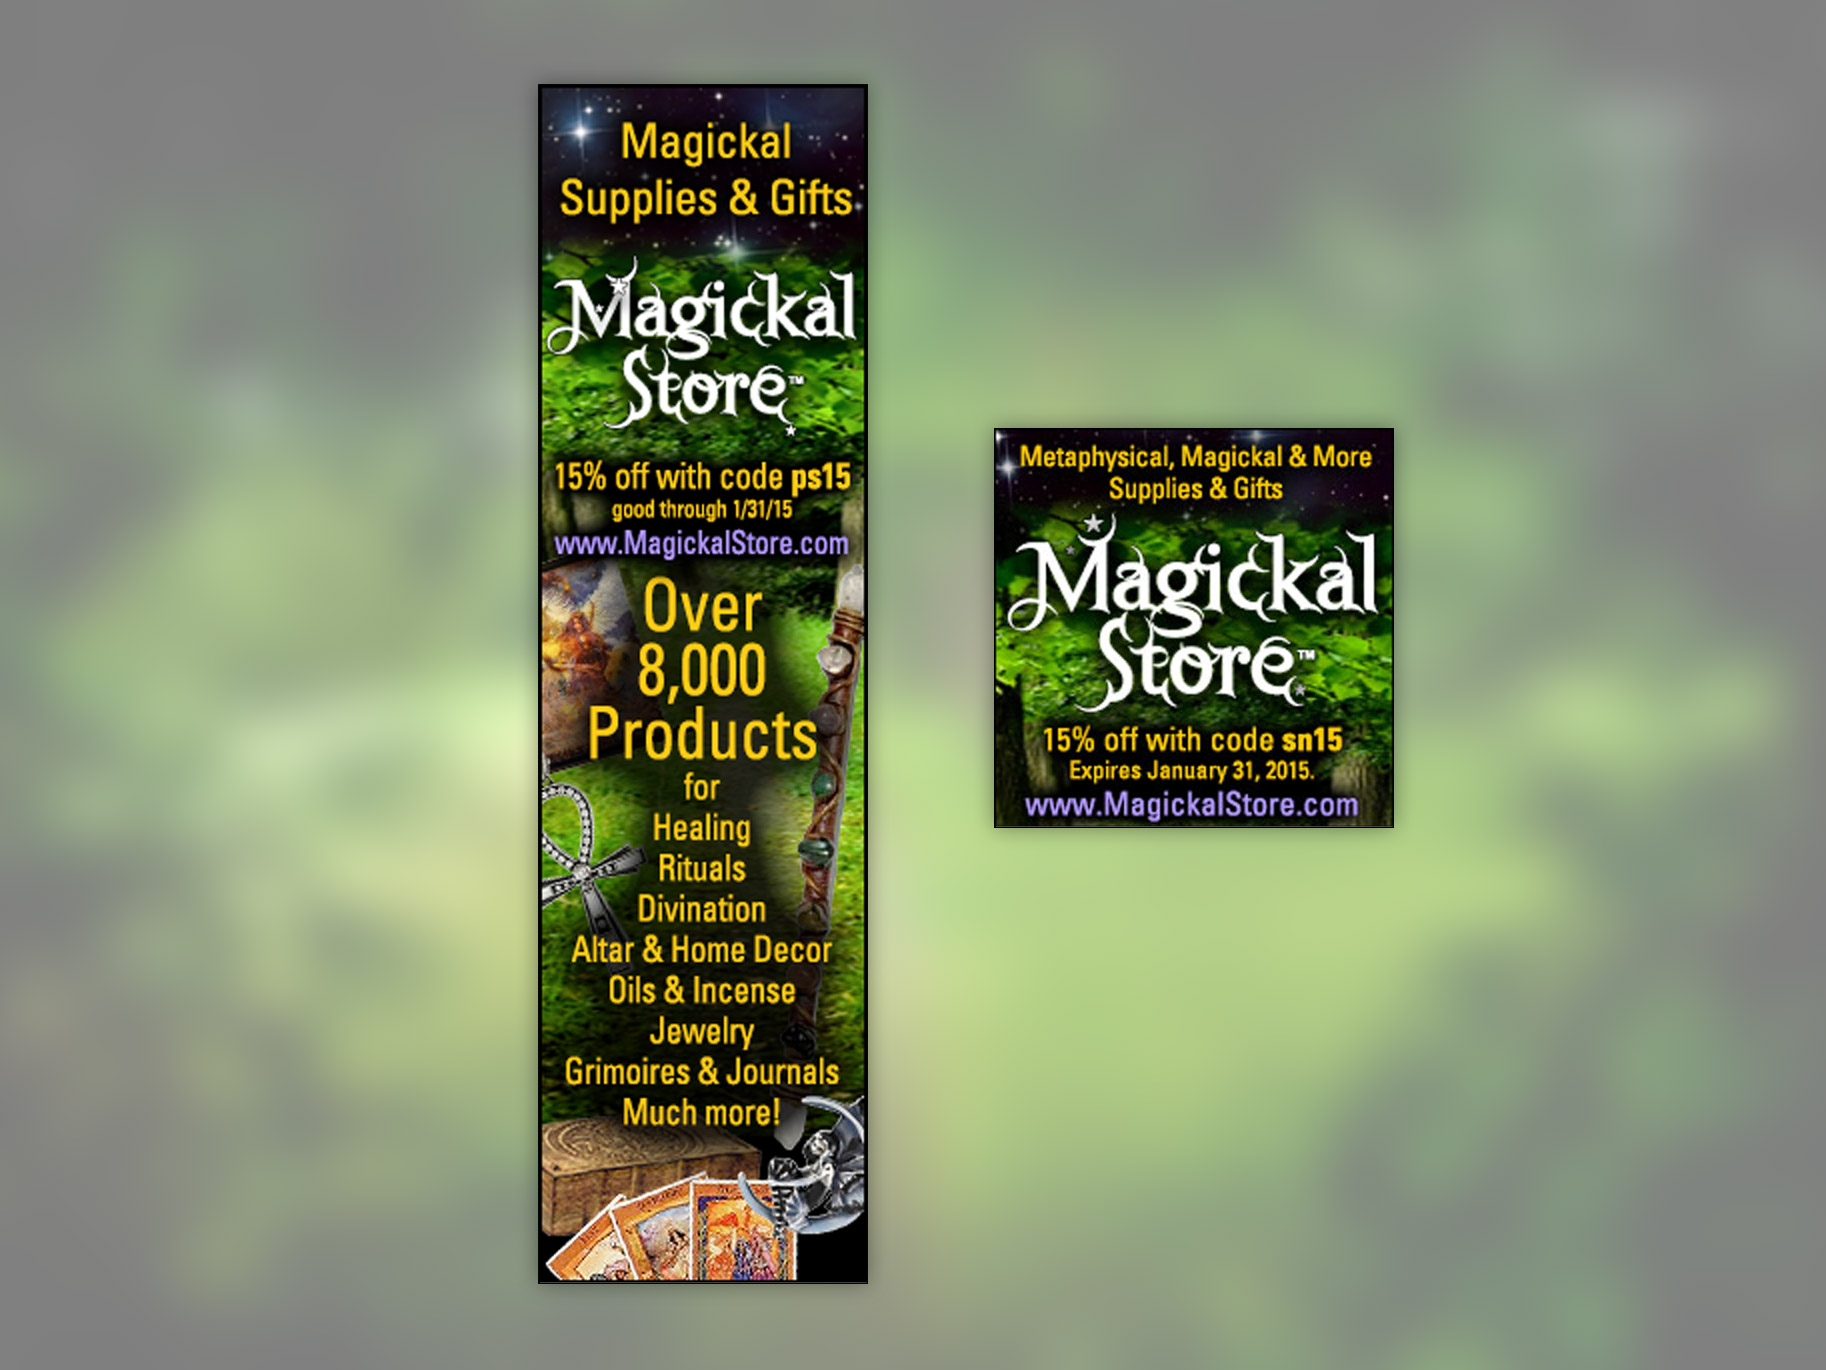 Magickal Store Internet Ads